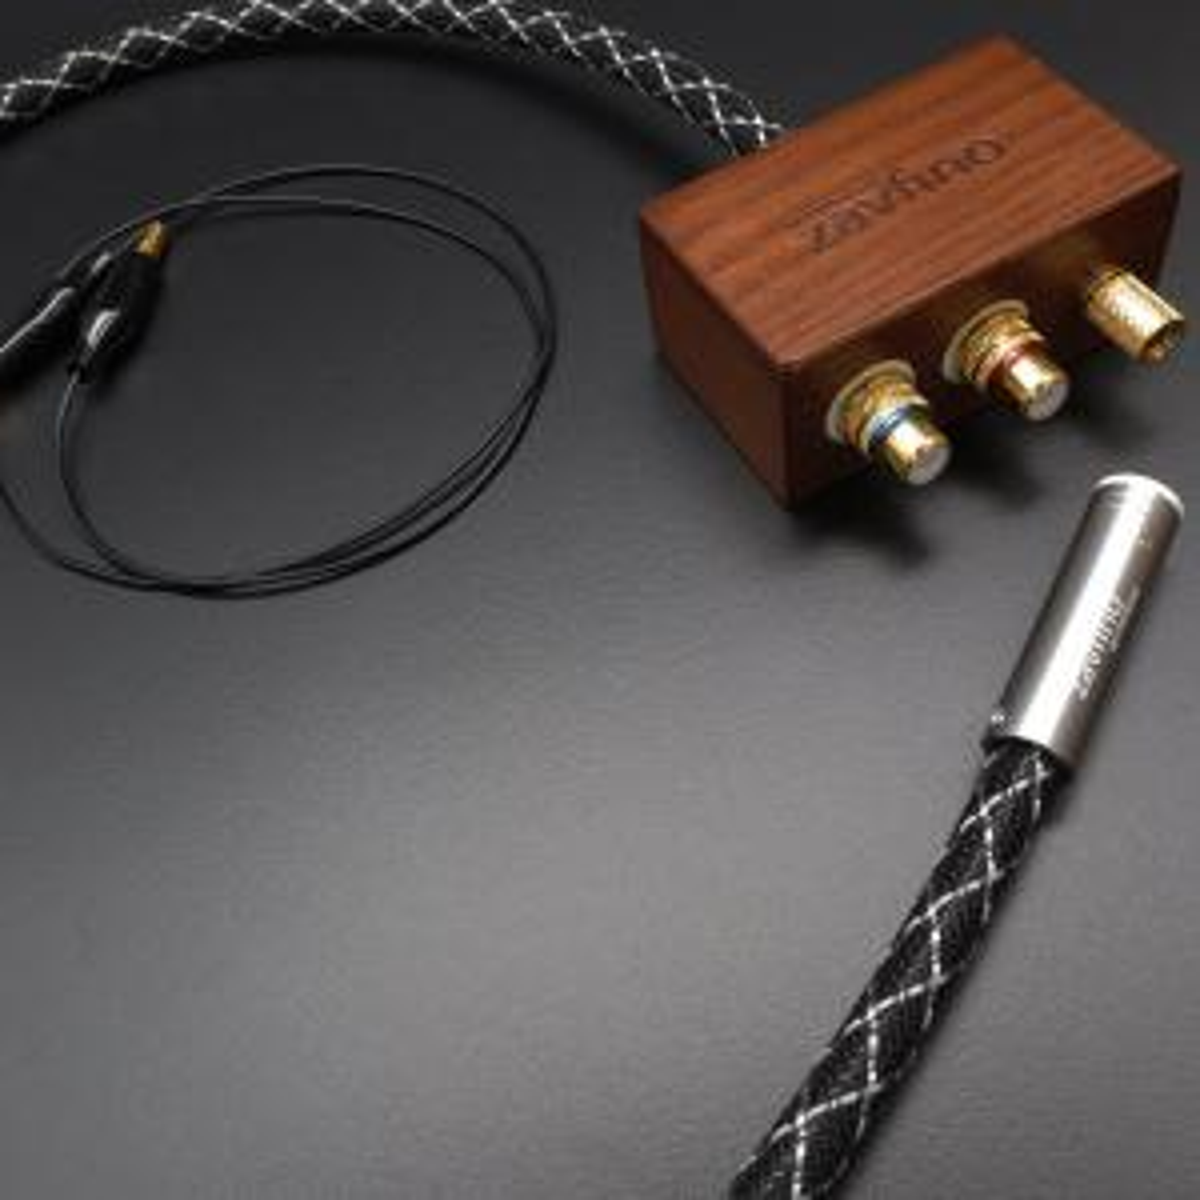 Фонокабель Zavfino The Spirit Phono Junction Box (прямой DIN-RCA) 0.45m